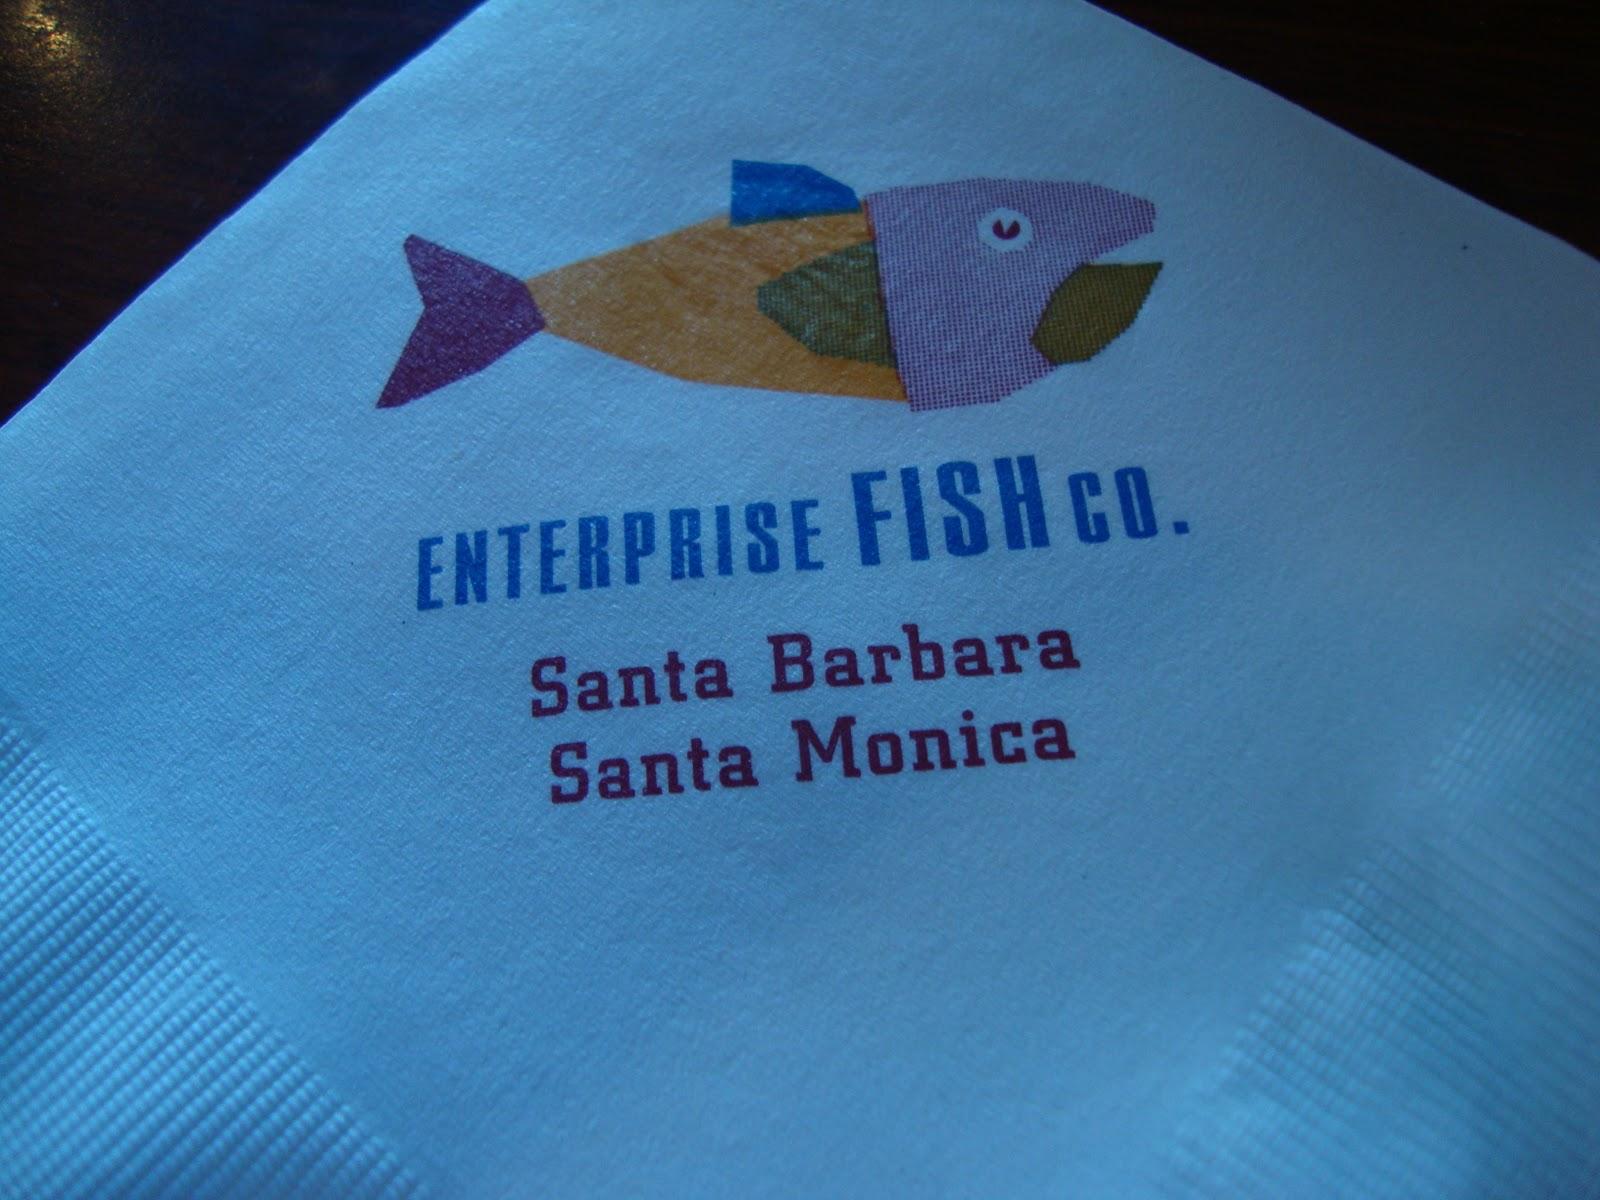 An immovable feast enterprise fish co santa barbara for Fish enterprise santa monica